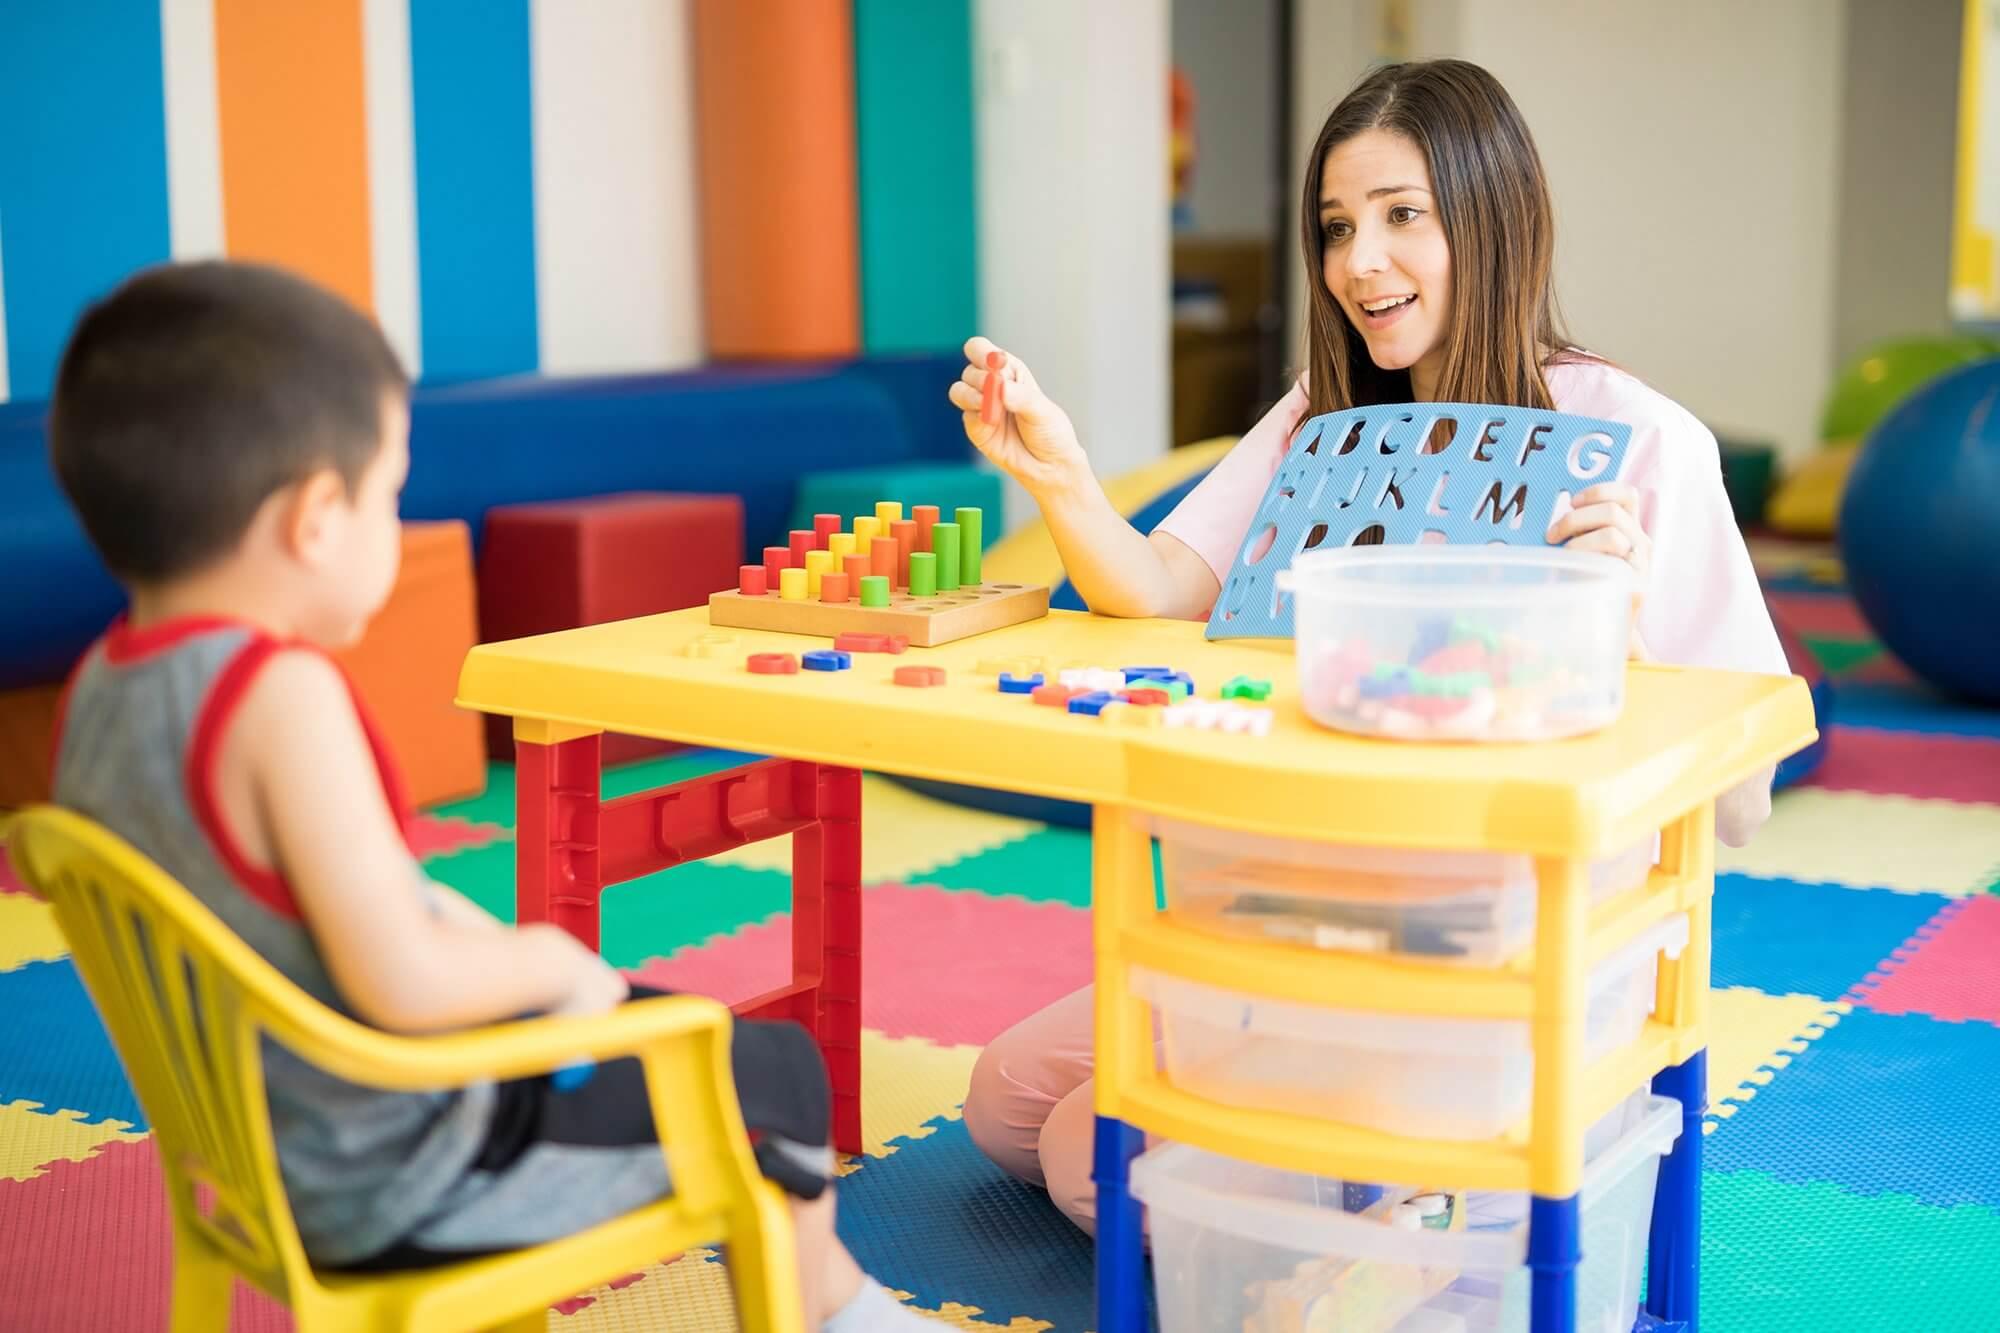 Behavioral Analysis teaching children